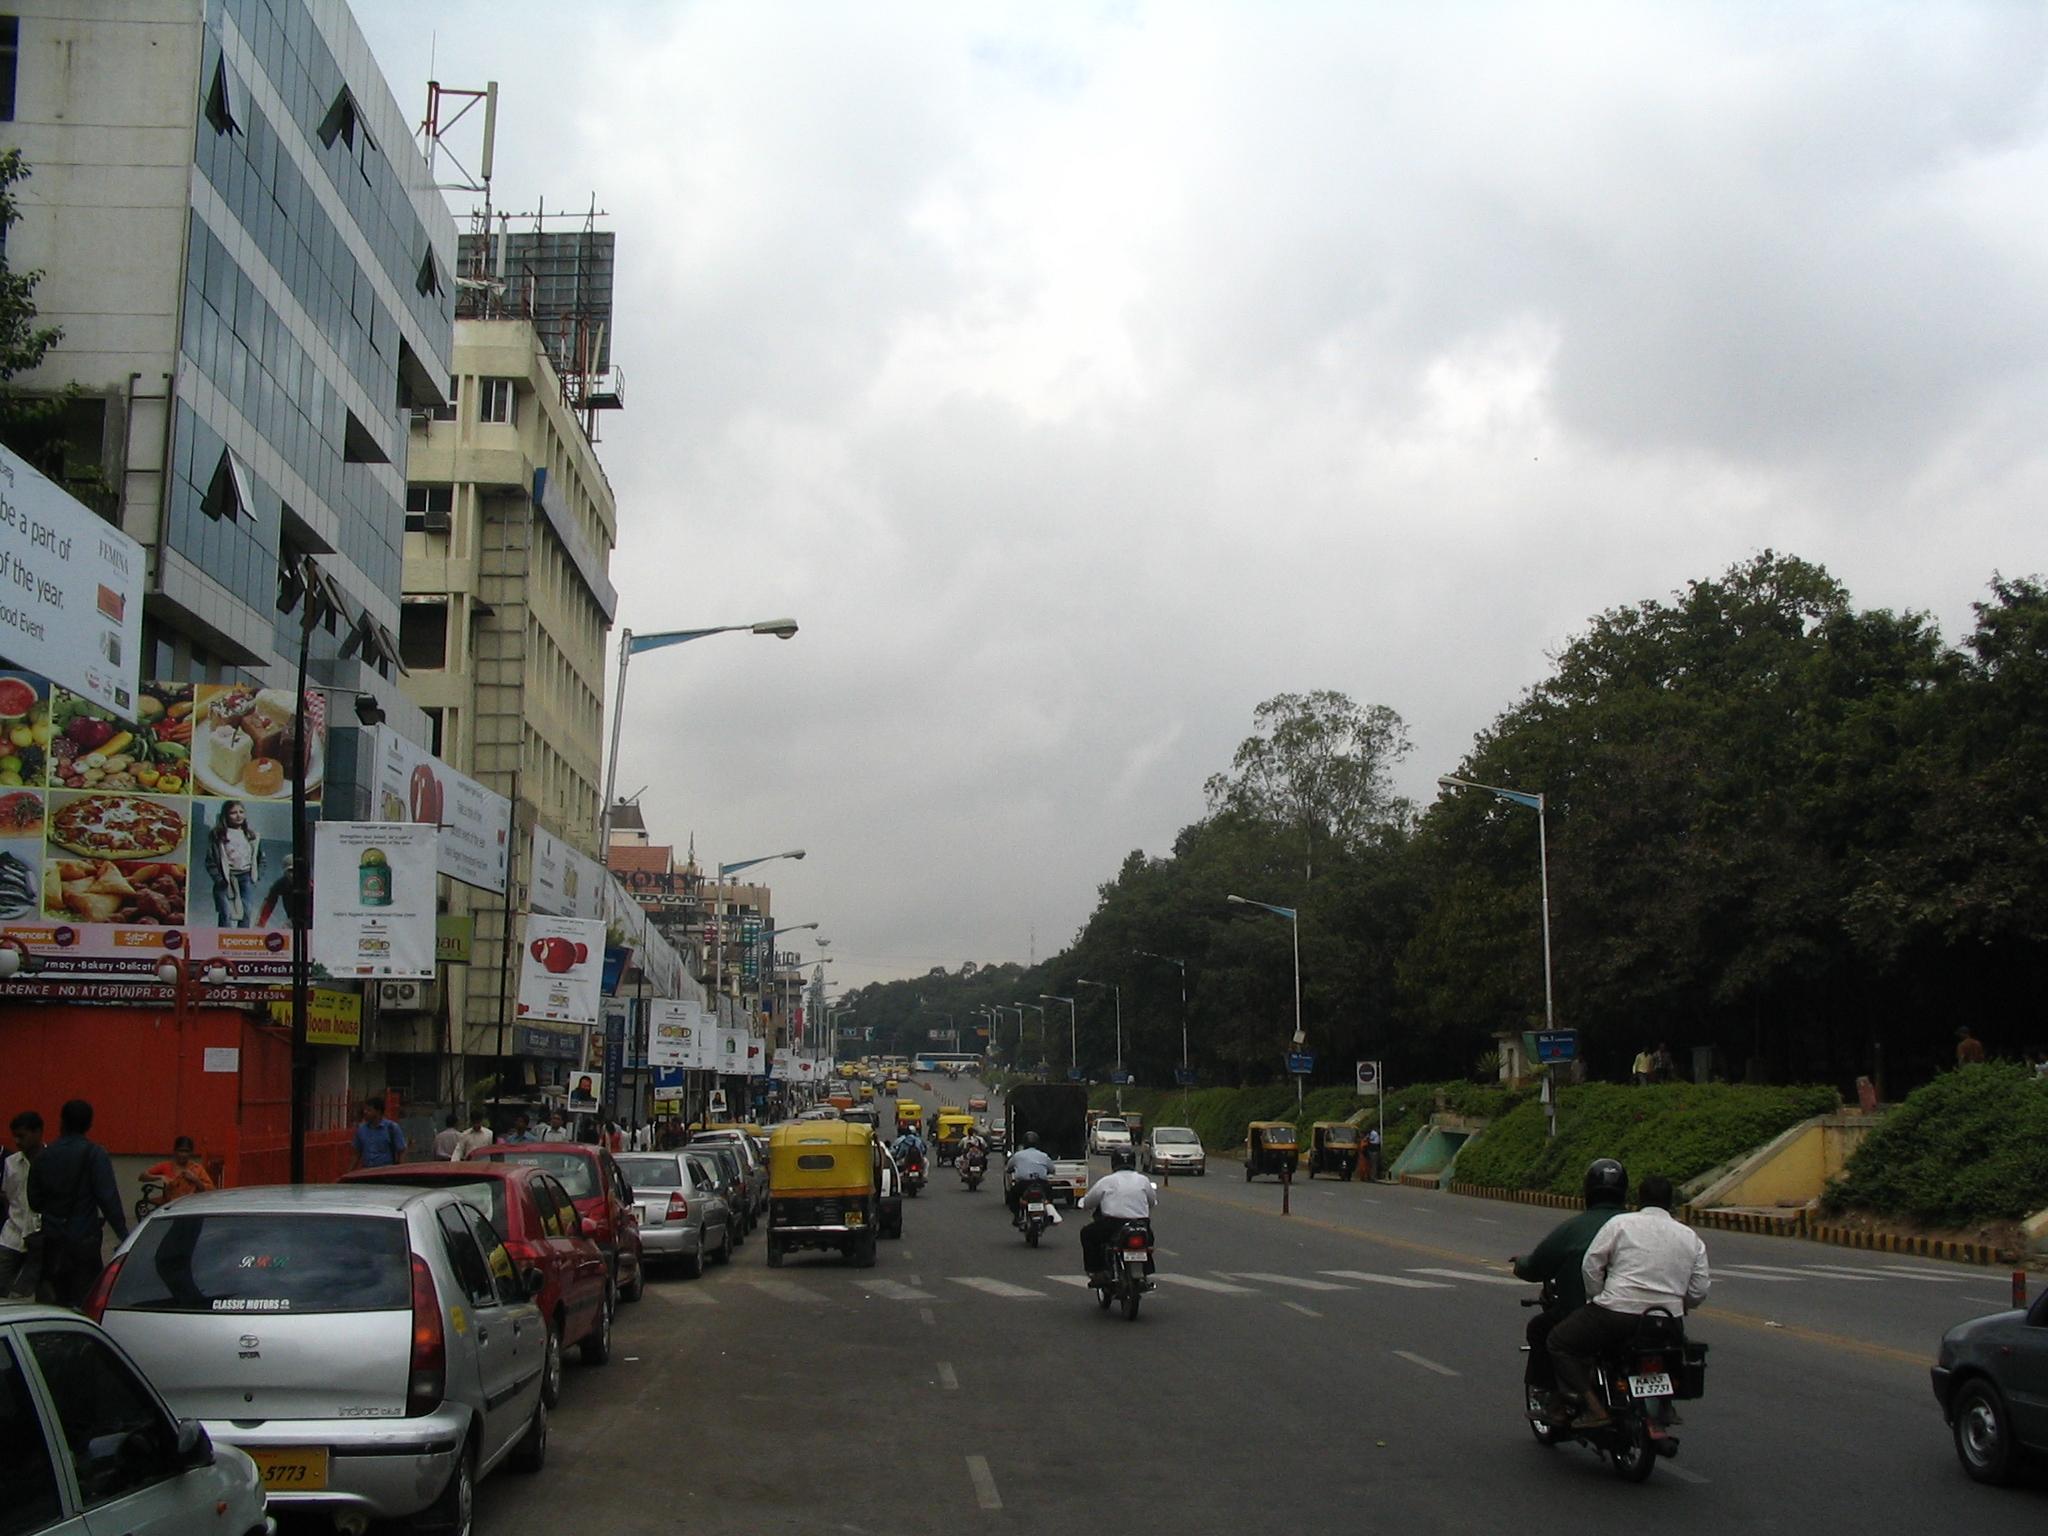 Forex mg road bangalore